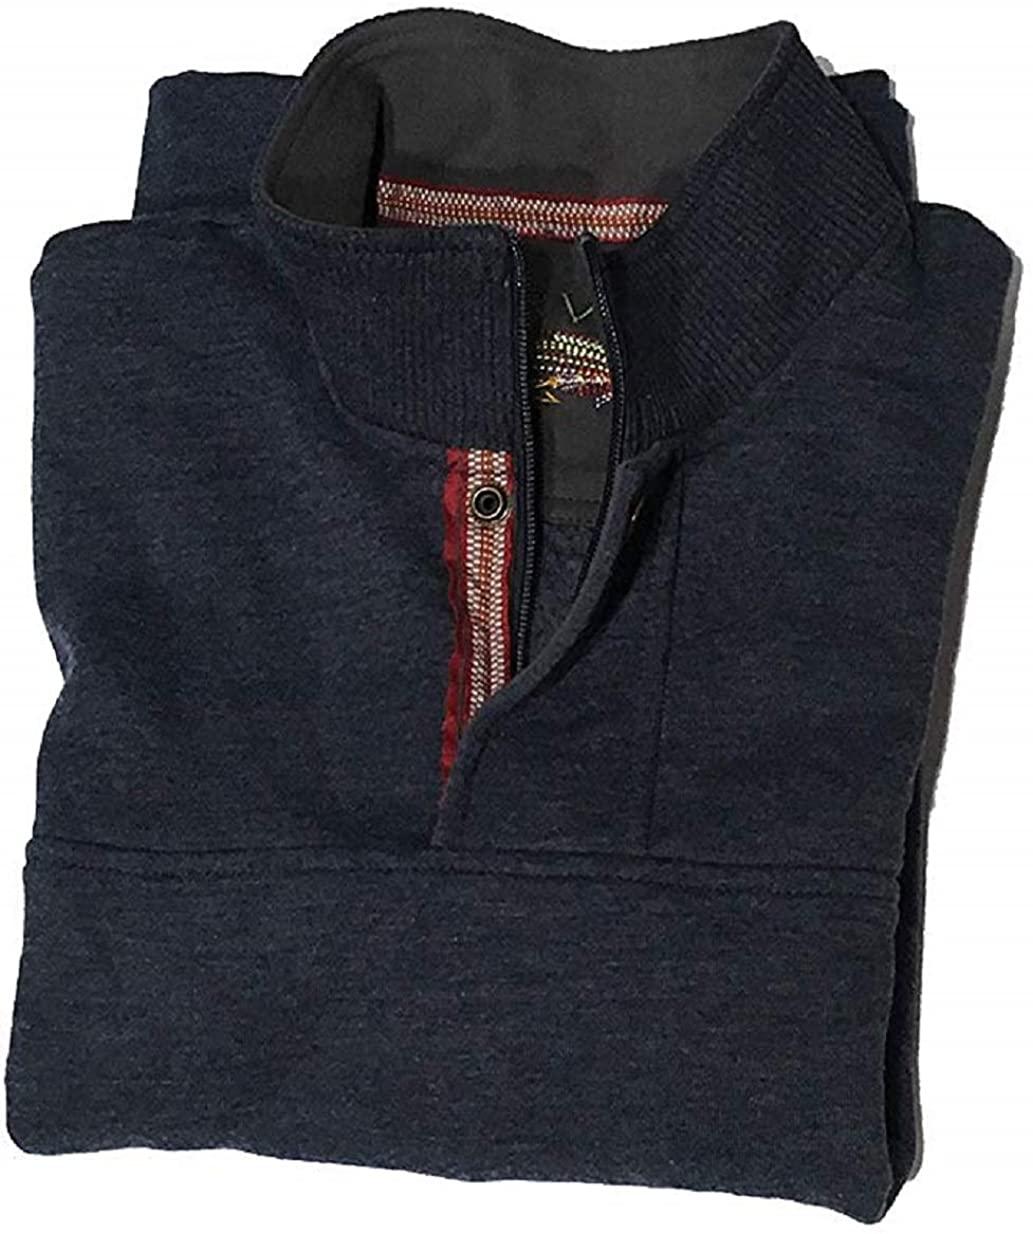 Orvis Men's Signature Fleece Pullover (Small, Heather Navy)